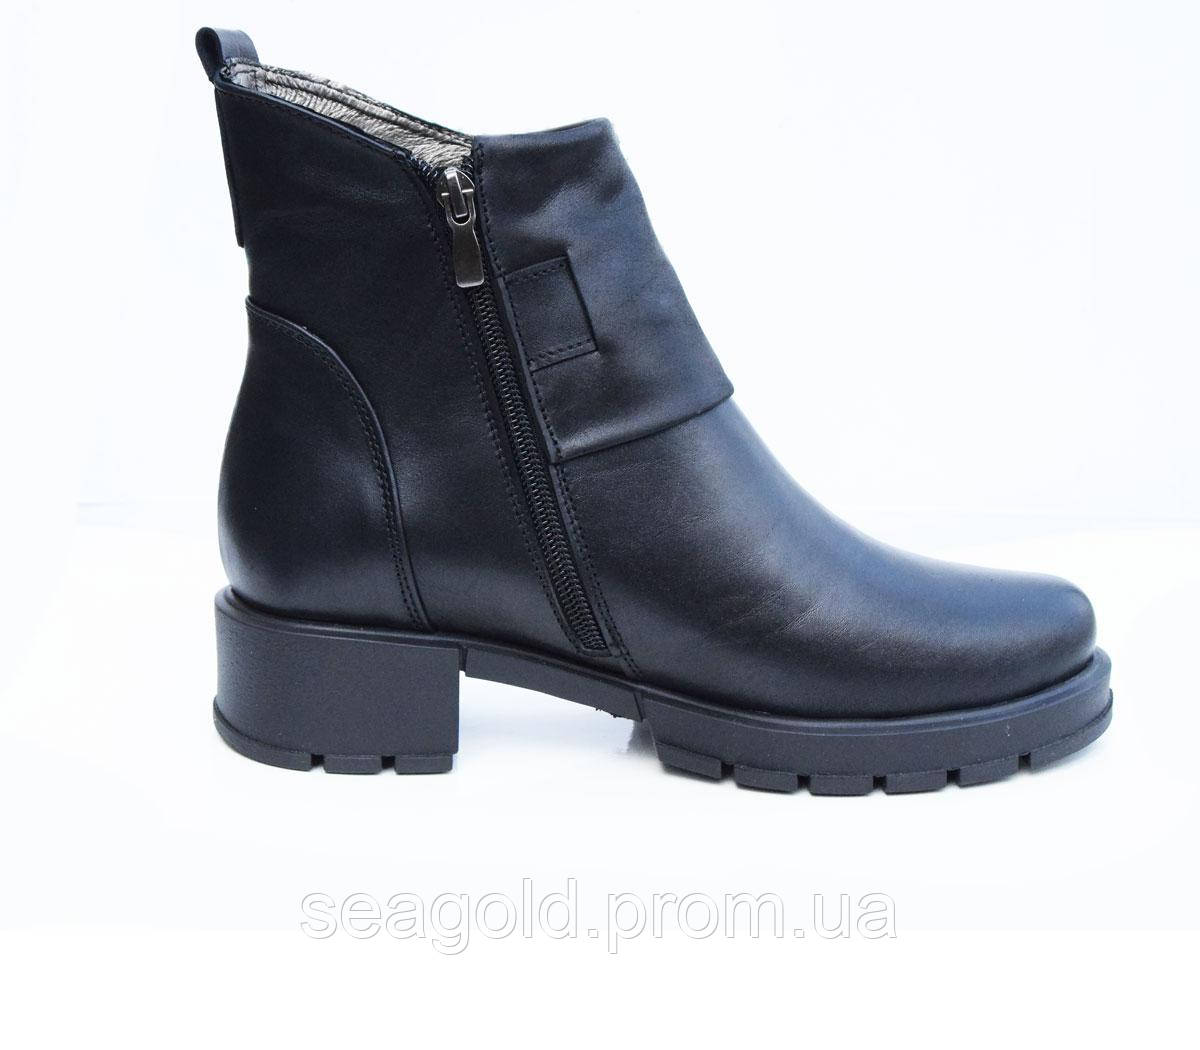 28ae42a41441 Женские модные кожаные ботинки мод.